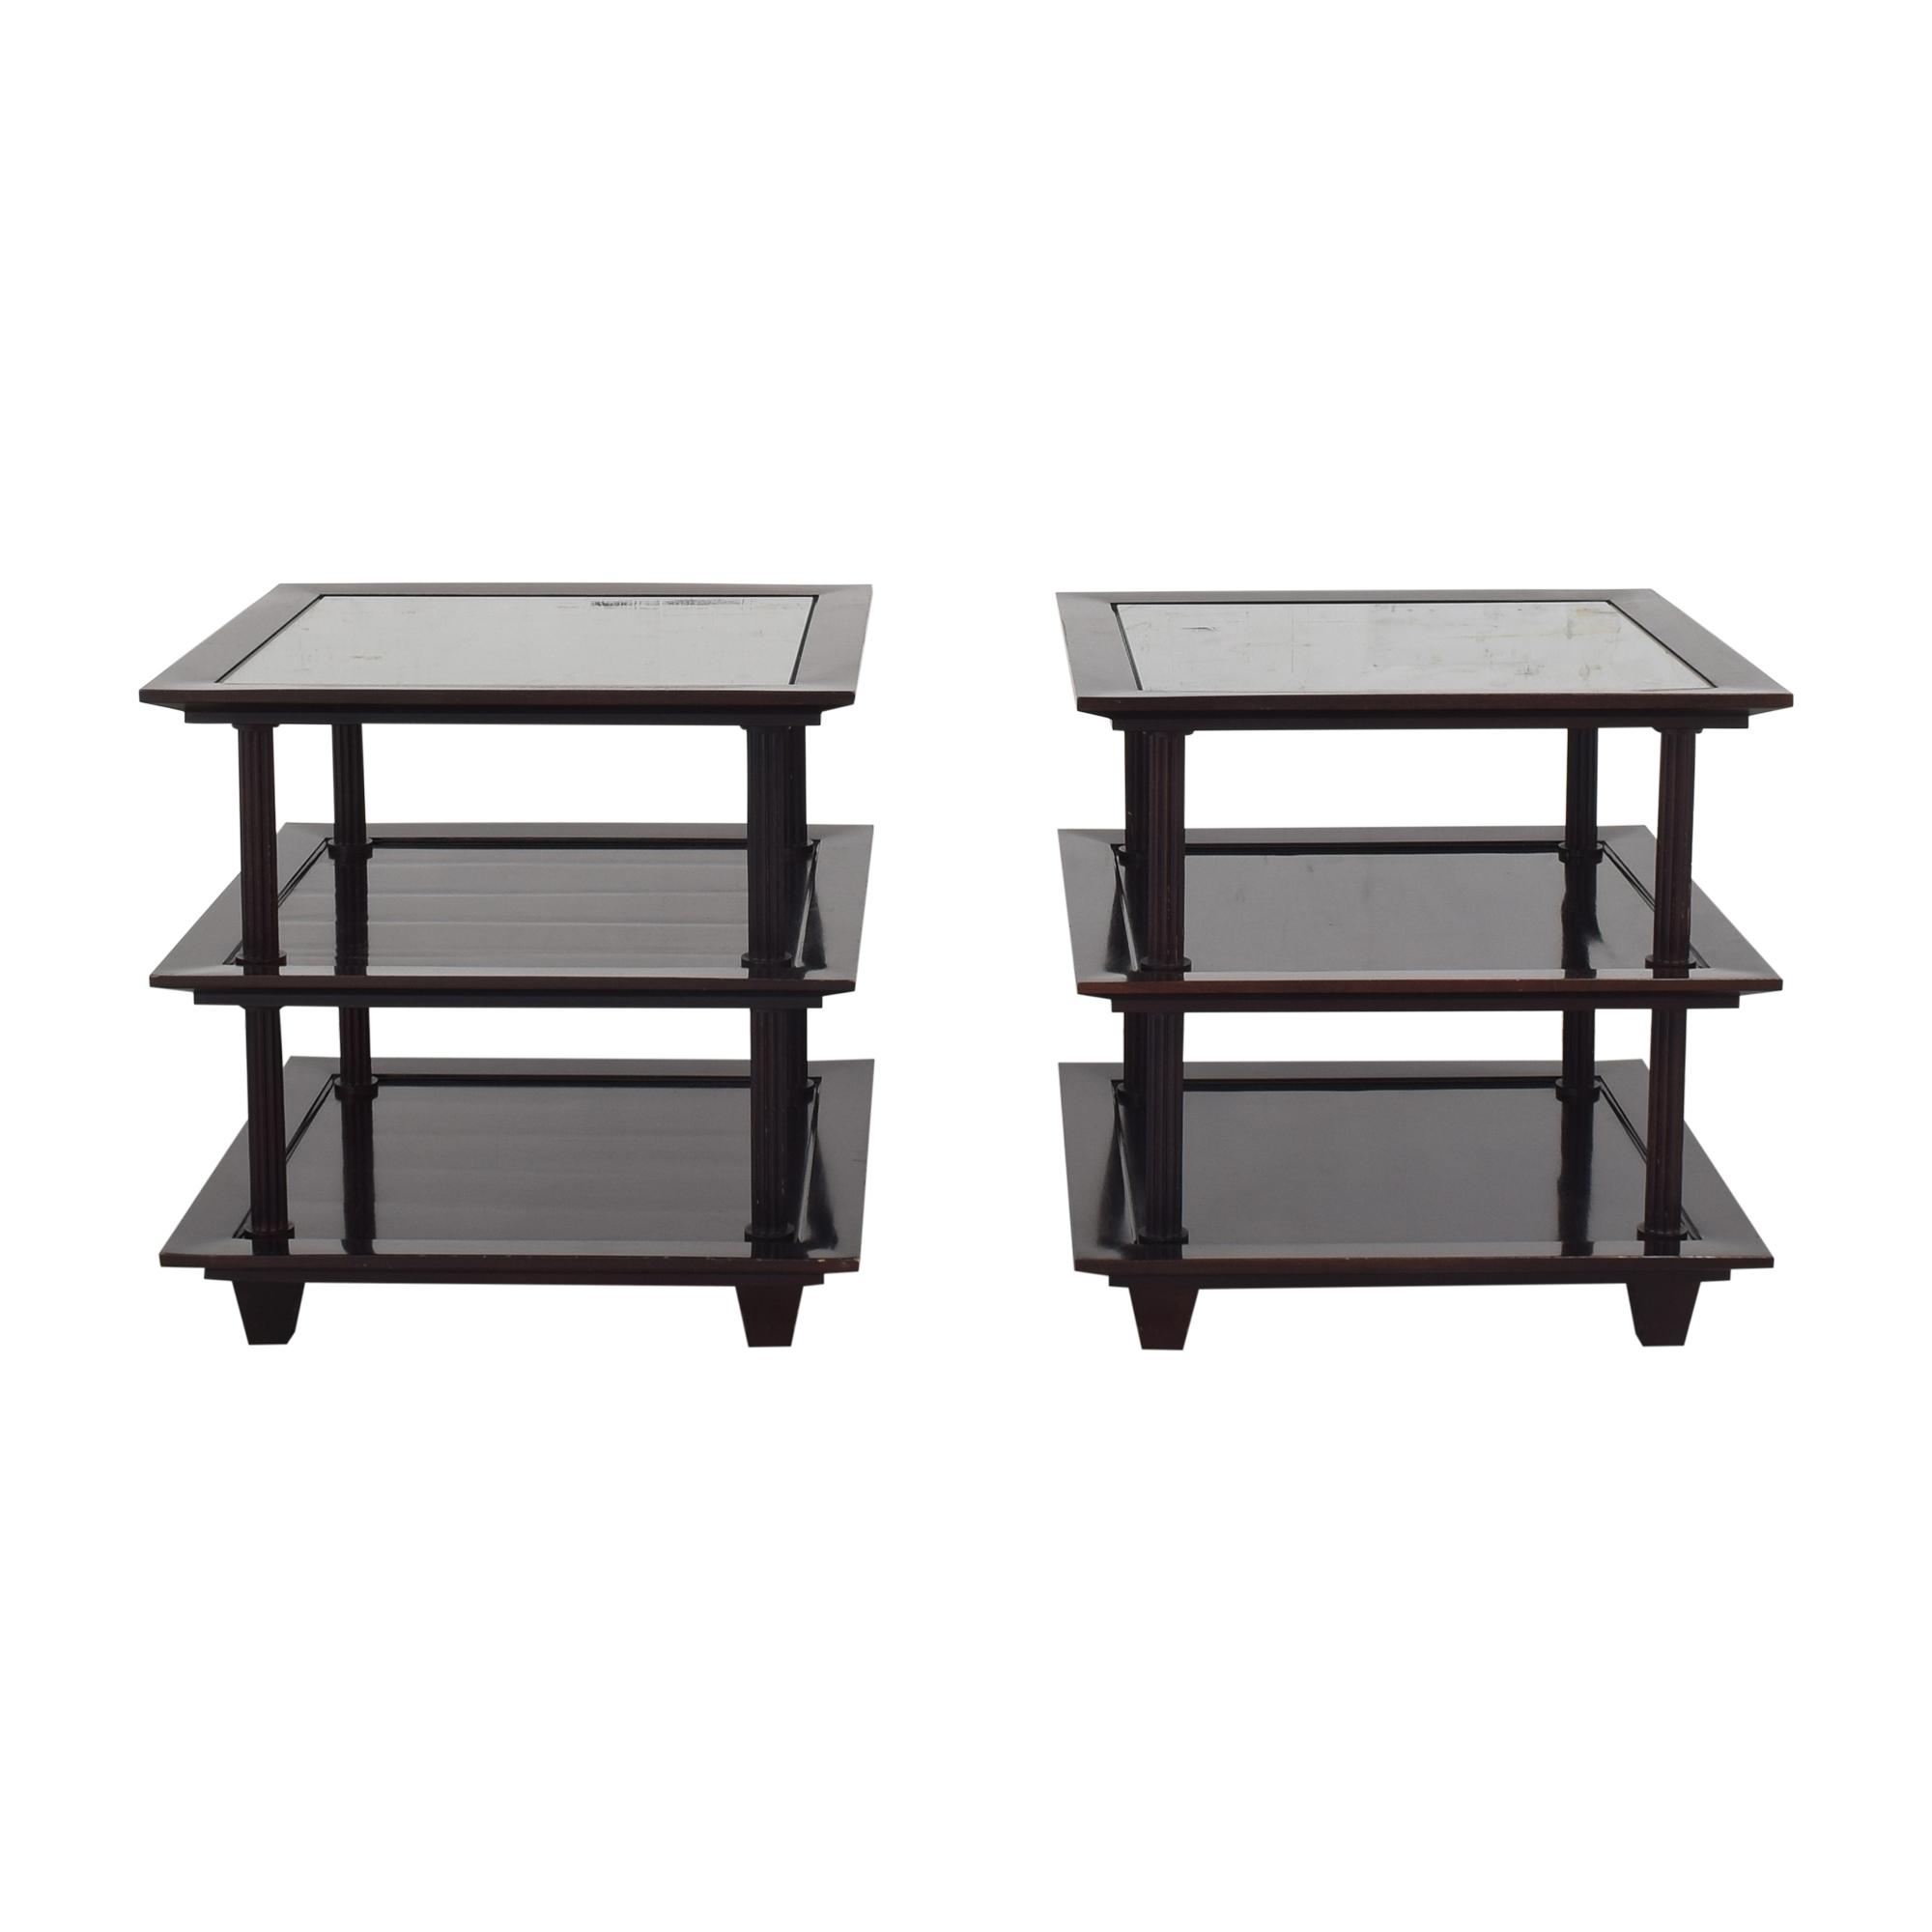 shop Baker Furniture Baker Furniture Three Tier Side Tables by Barbara Barry online